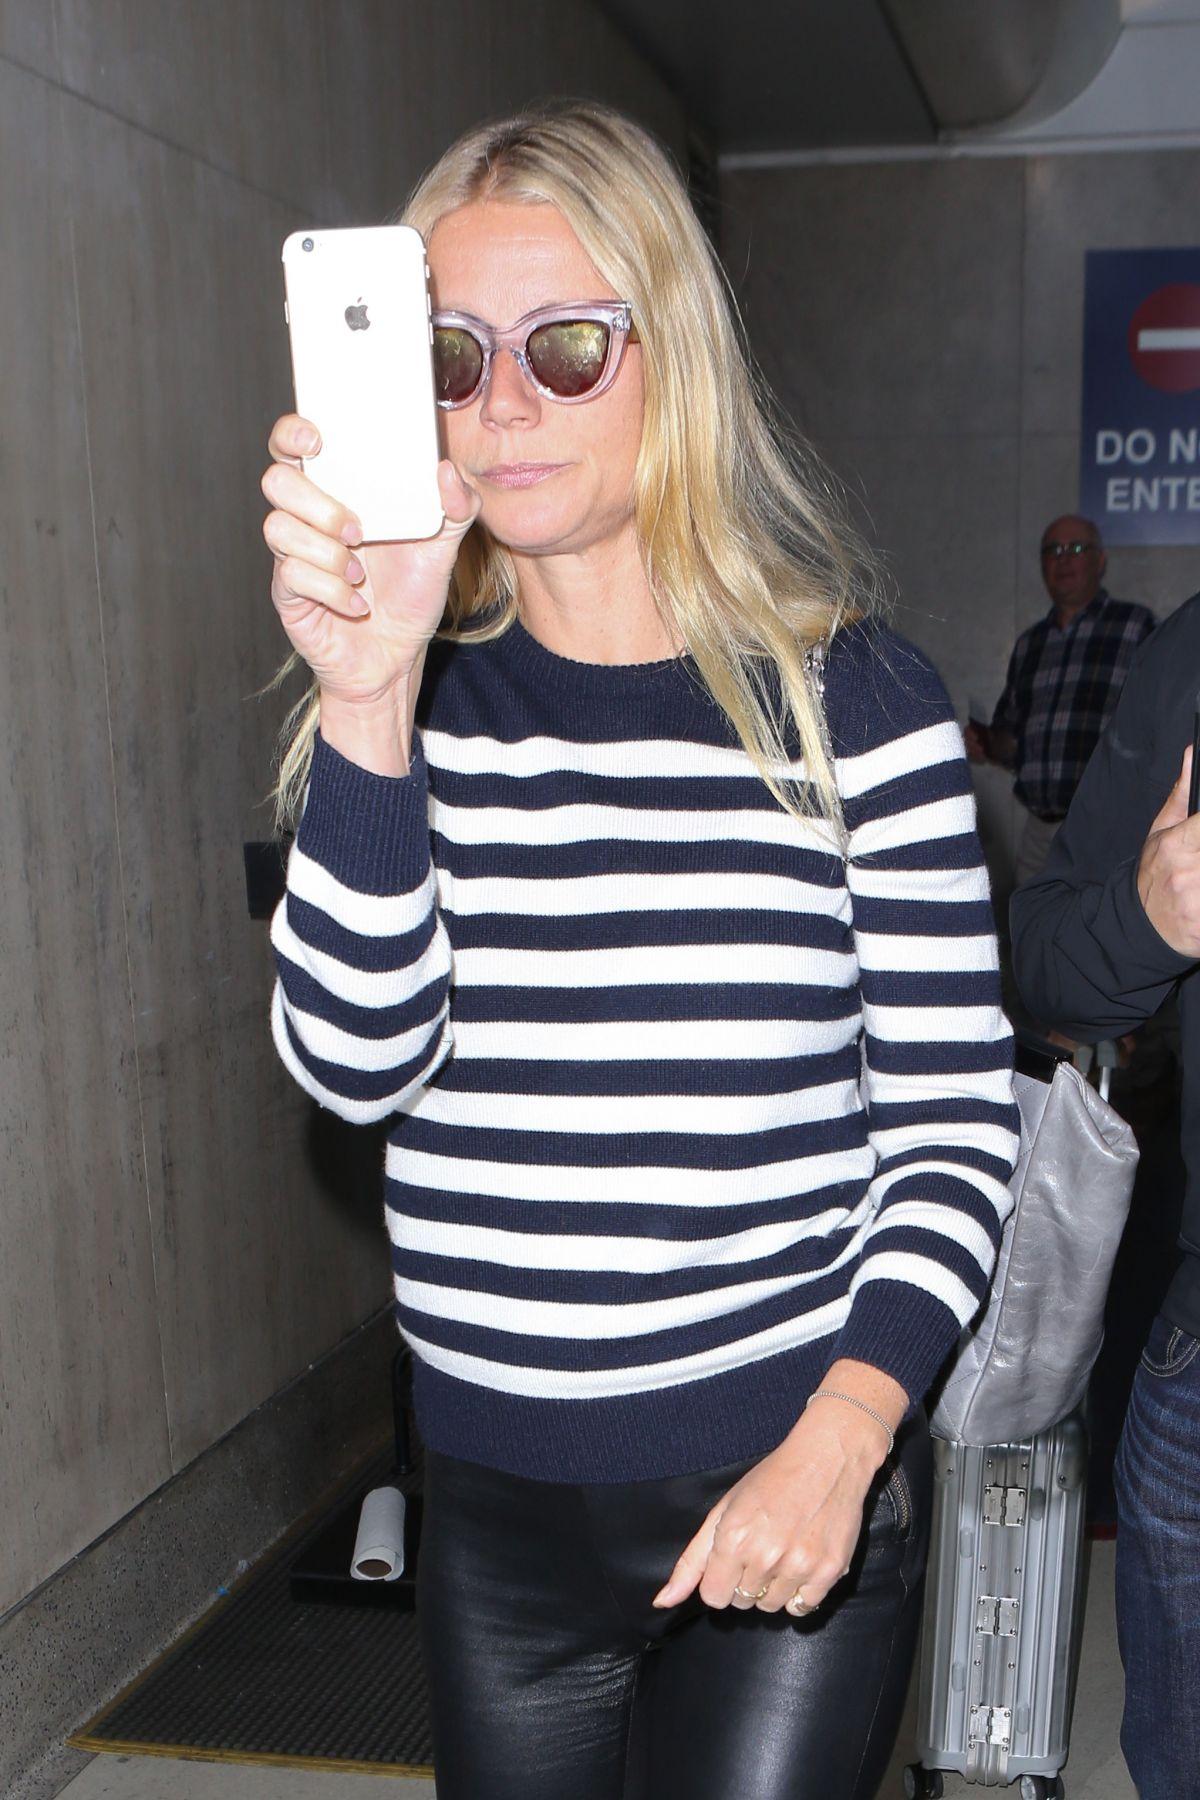 GWYNETH PALTROW Arrives at Los Angeles International Airport 05/22/2015